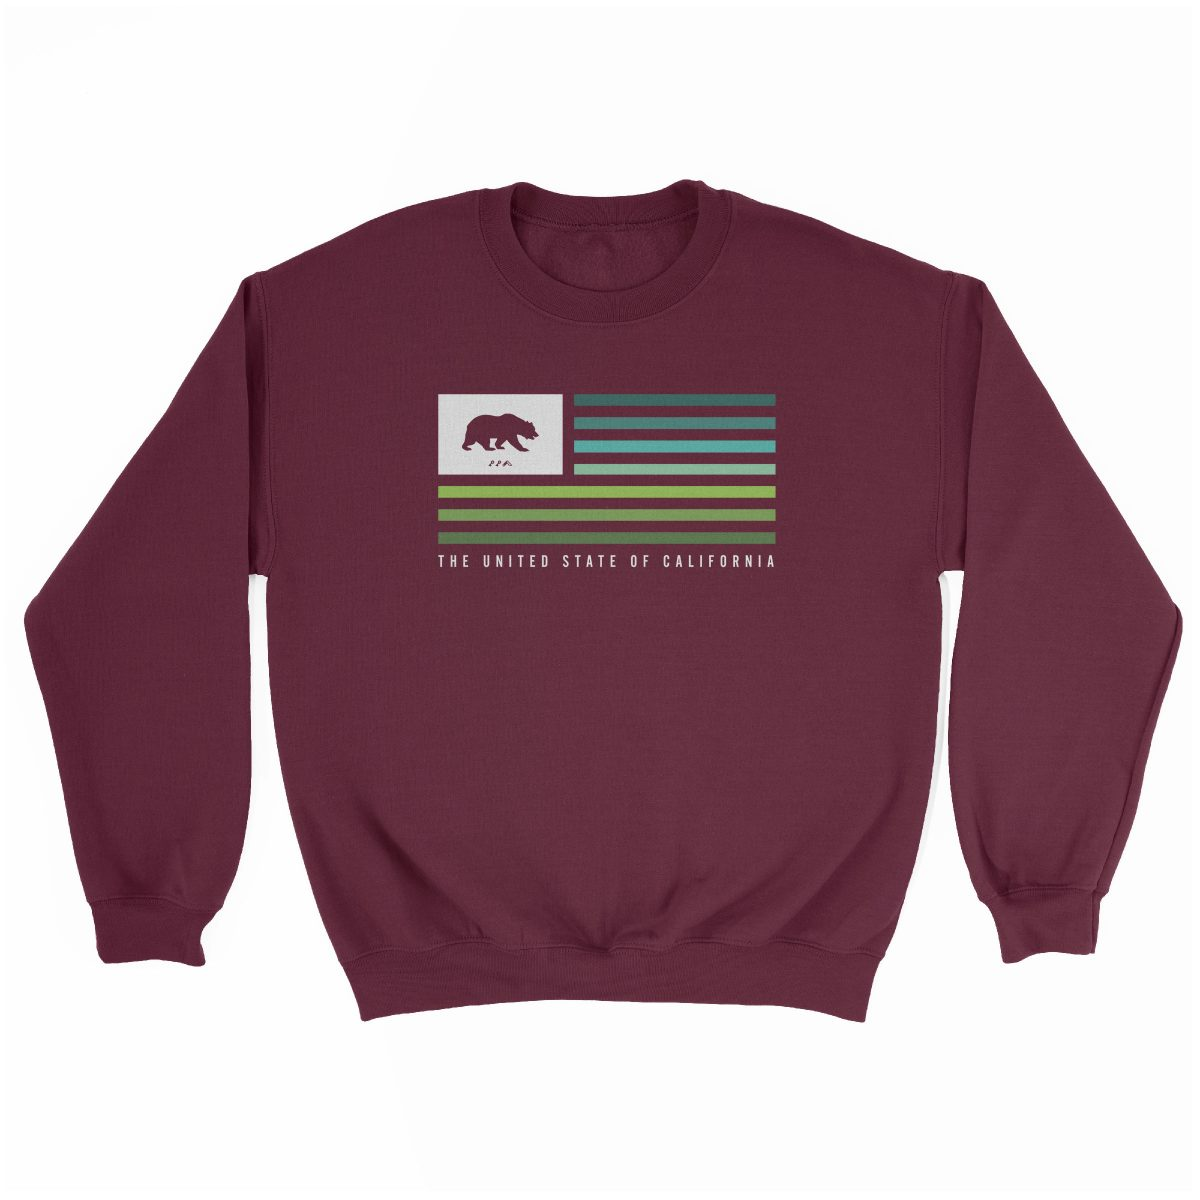 retro CALIFORNIA music festival cali summer beach sweatshirt in maroon